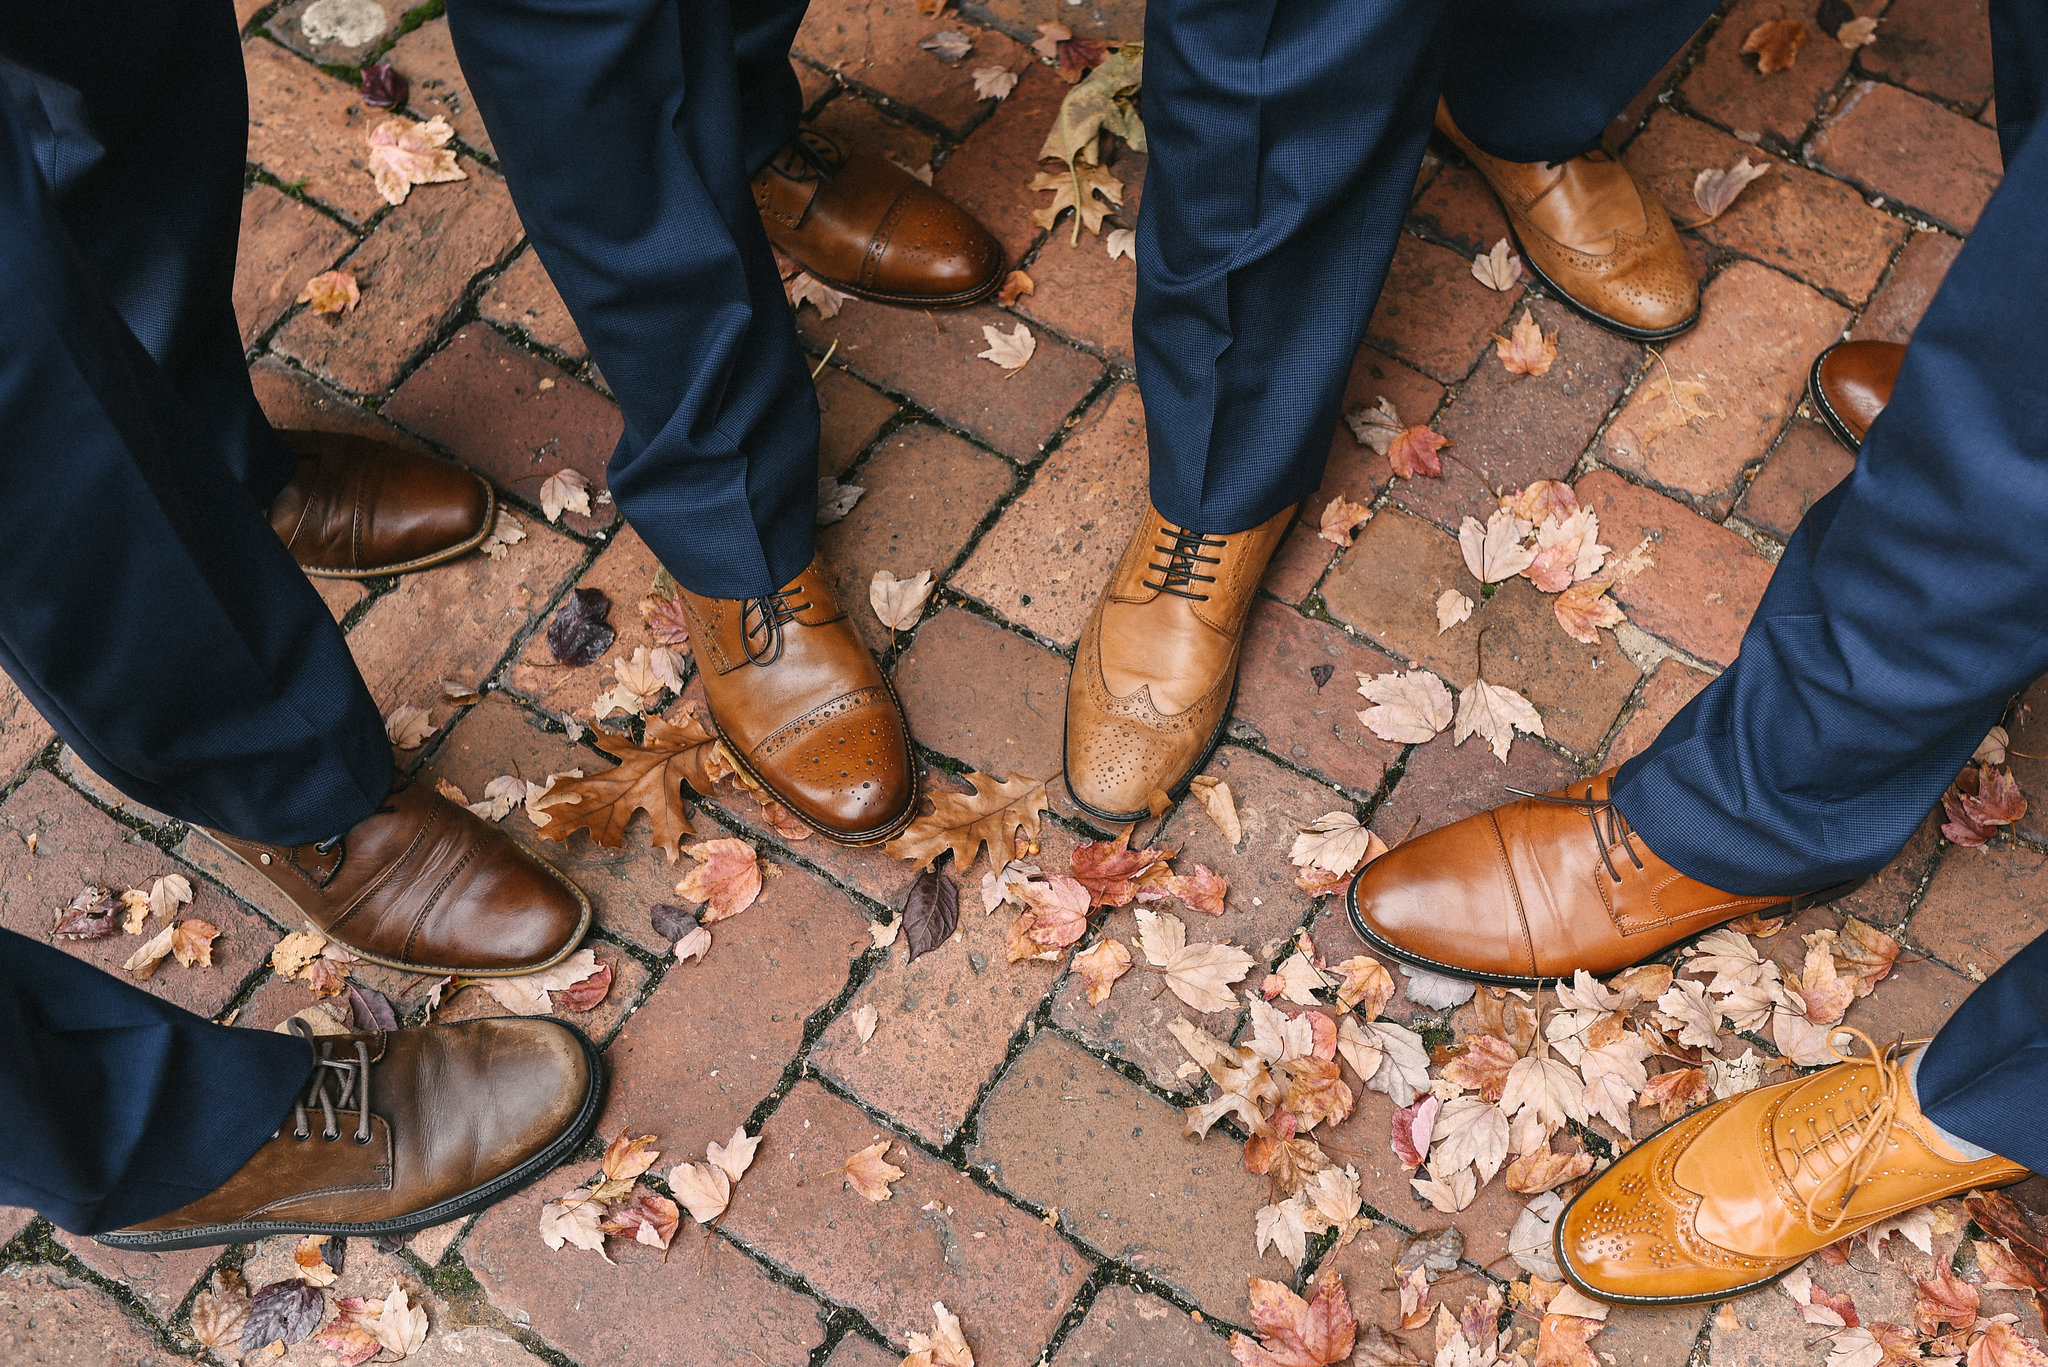 DC, Alexandria, Virginia, Fall Wedding, Historic Wedding, Old Town, DC, Jos A. Bank Suit, Groom and Groomsmen, Cobblestone, Shoe Detail, Detail Photos